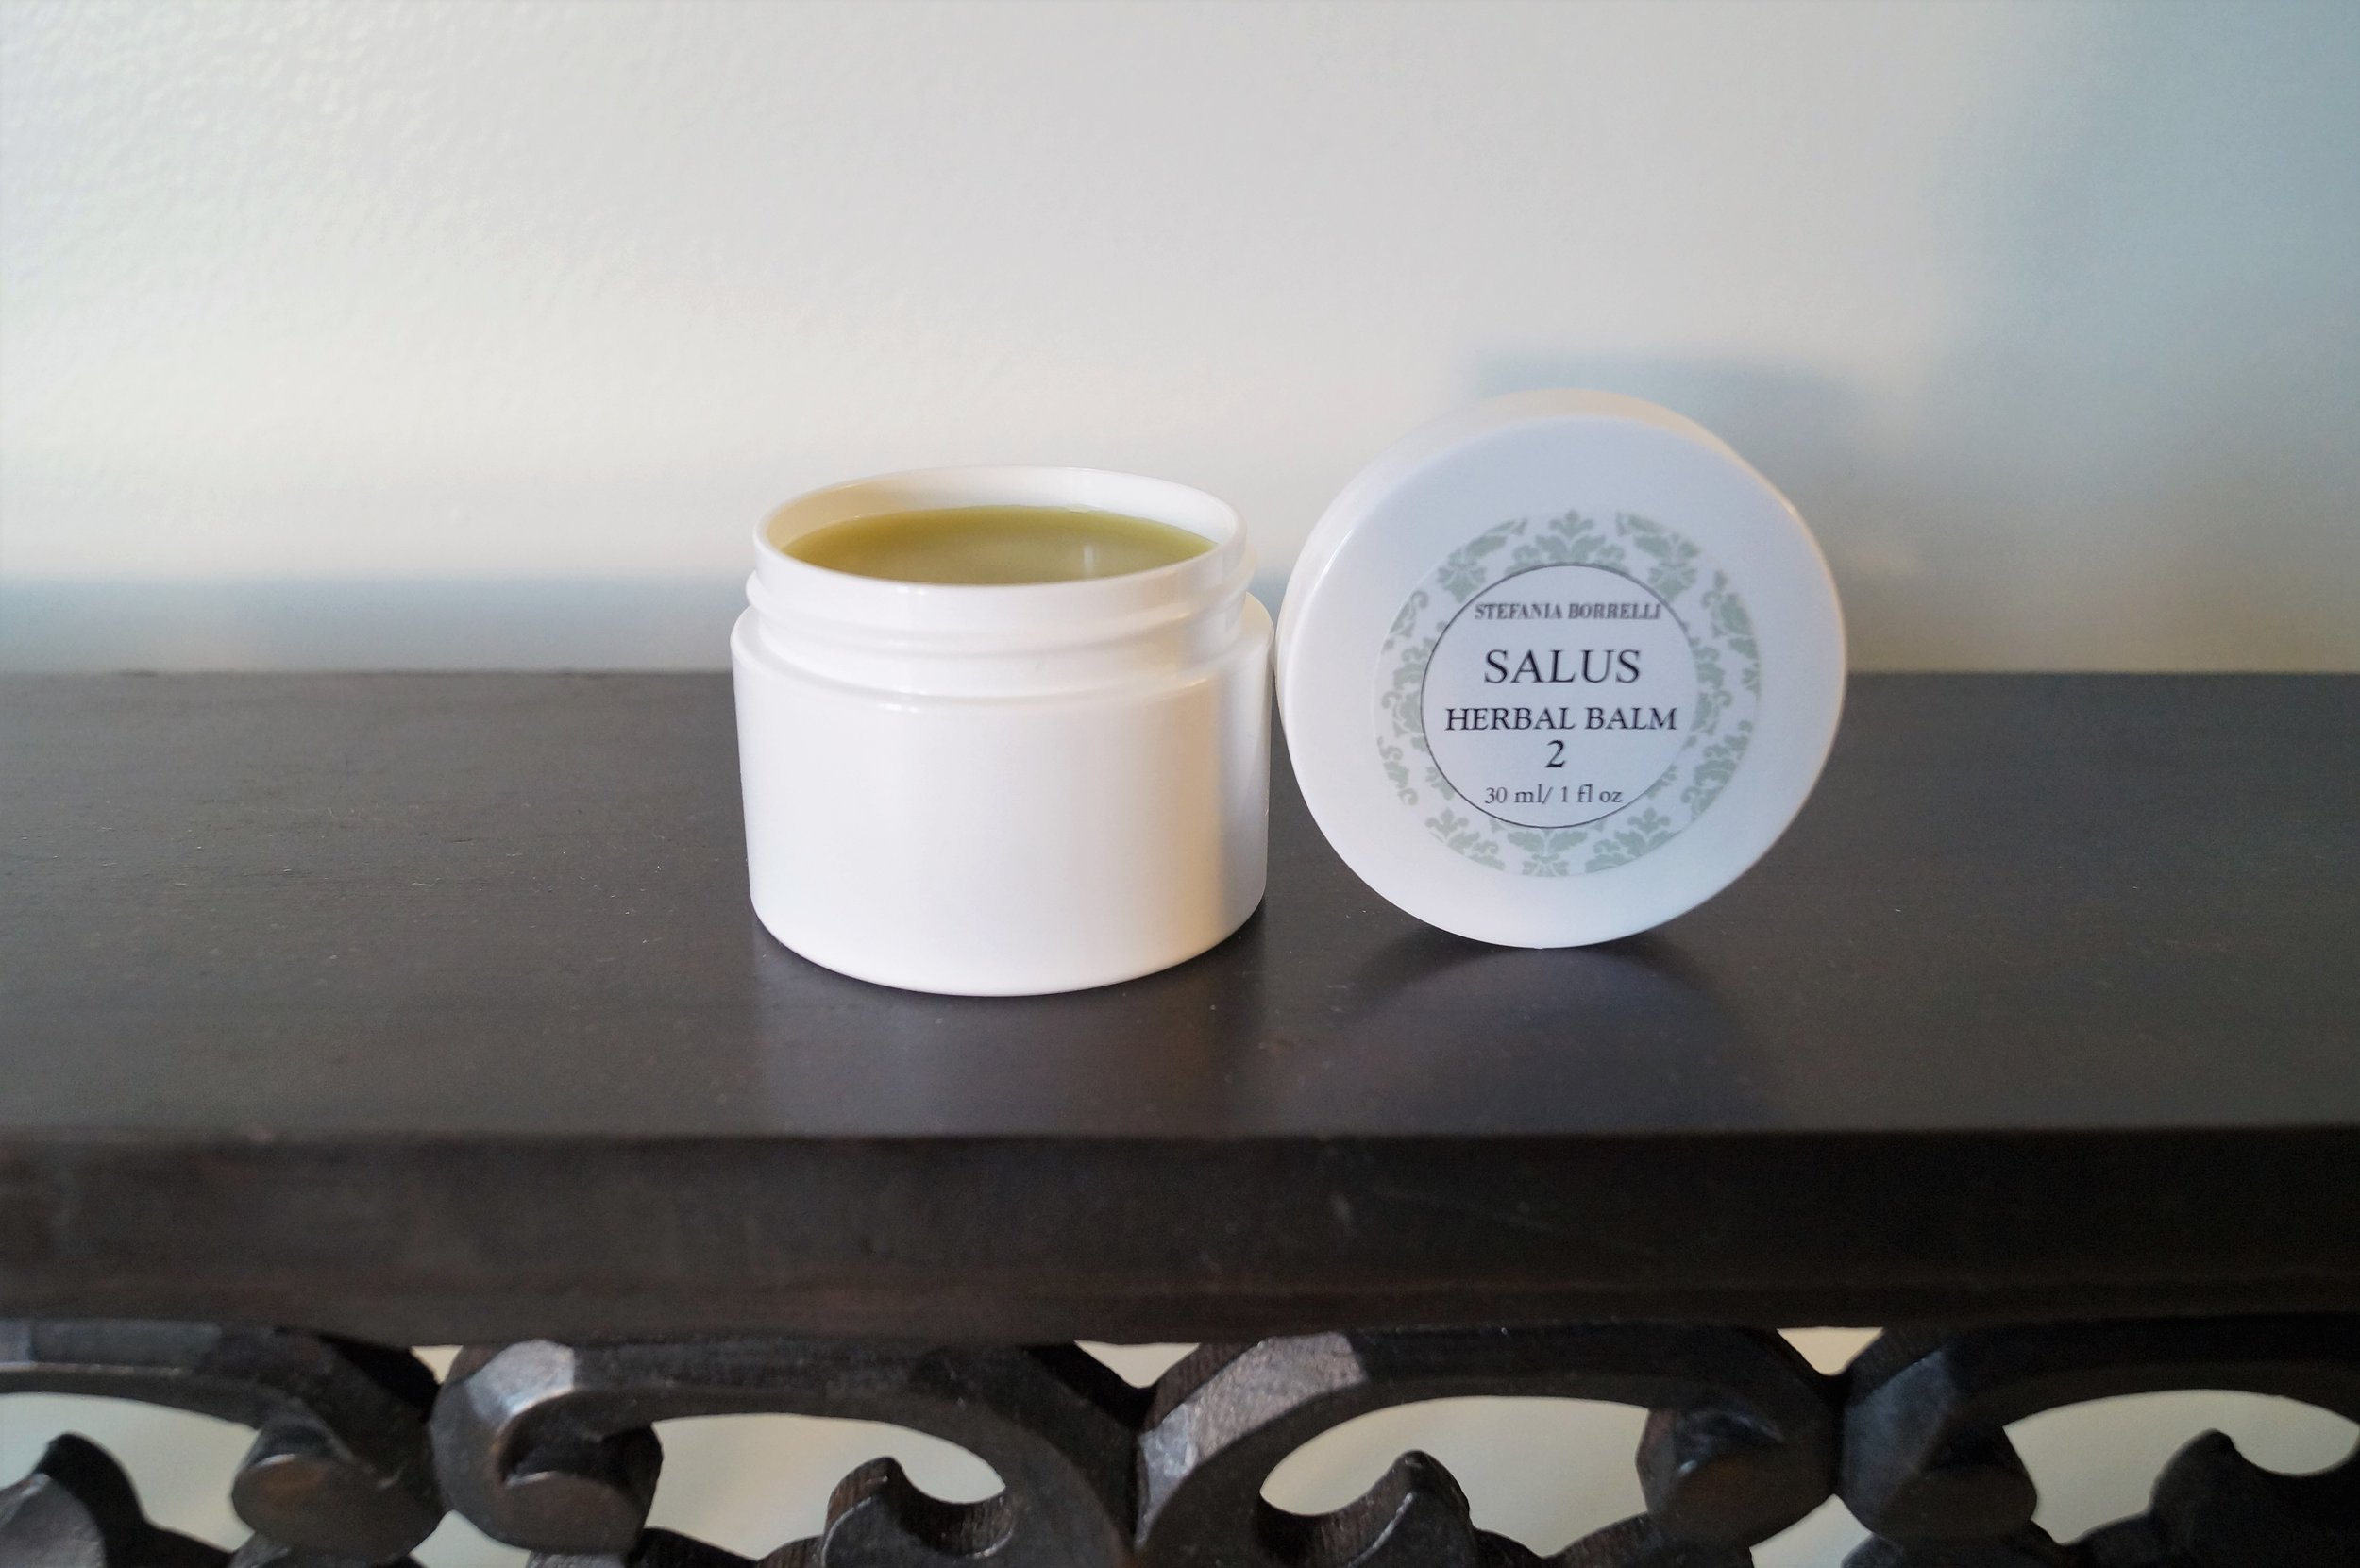 SALUS - Herbal Balm 2